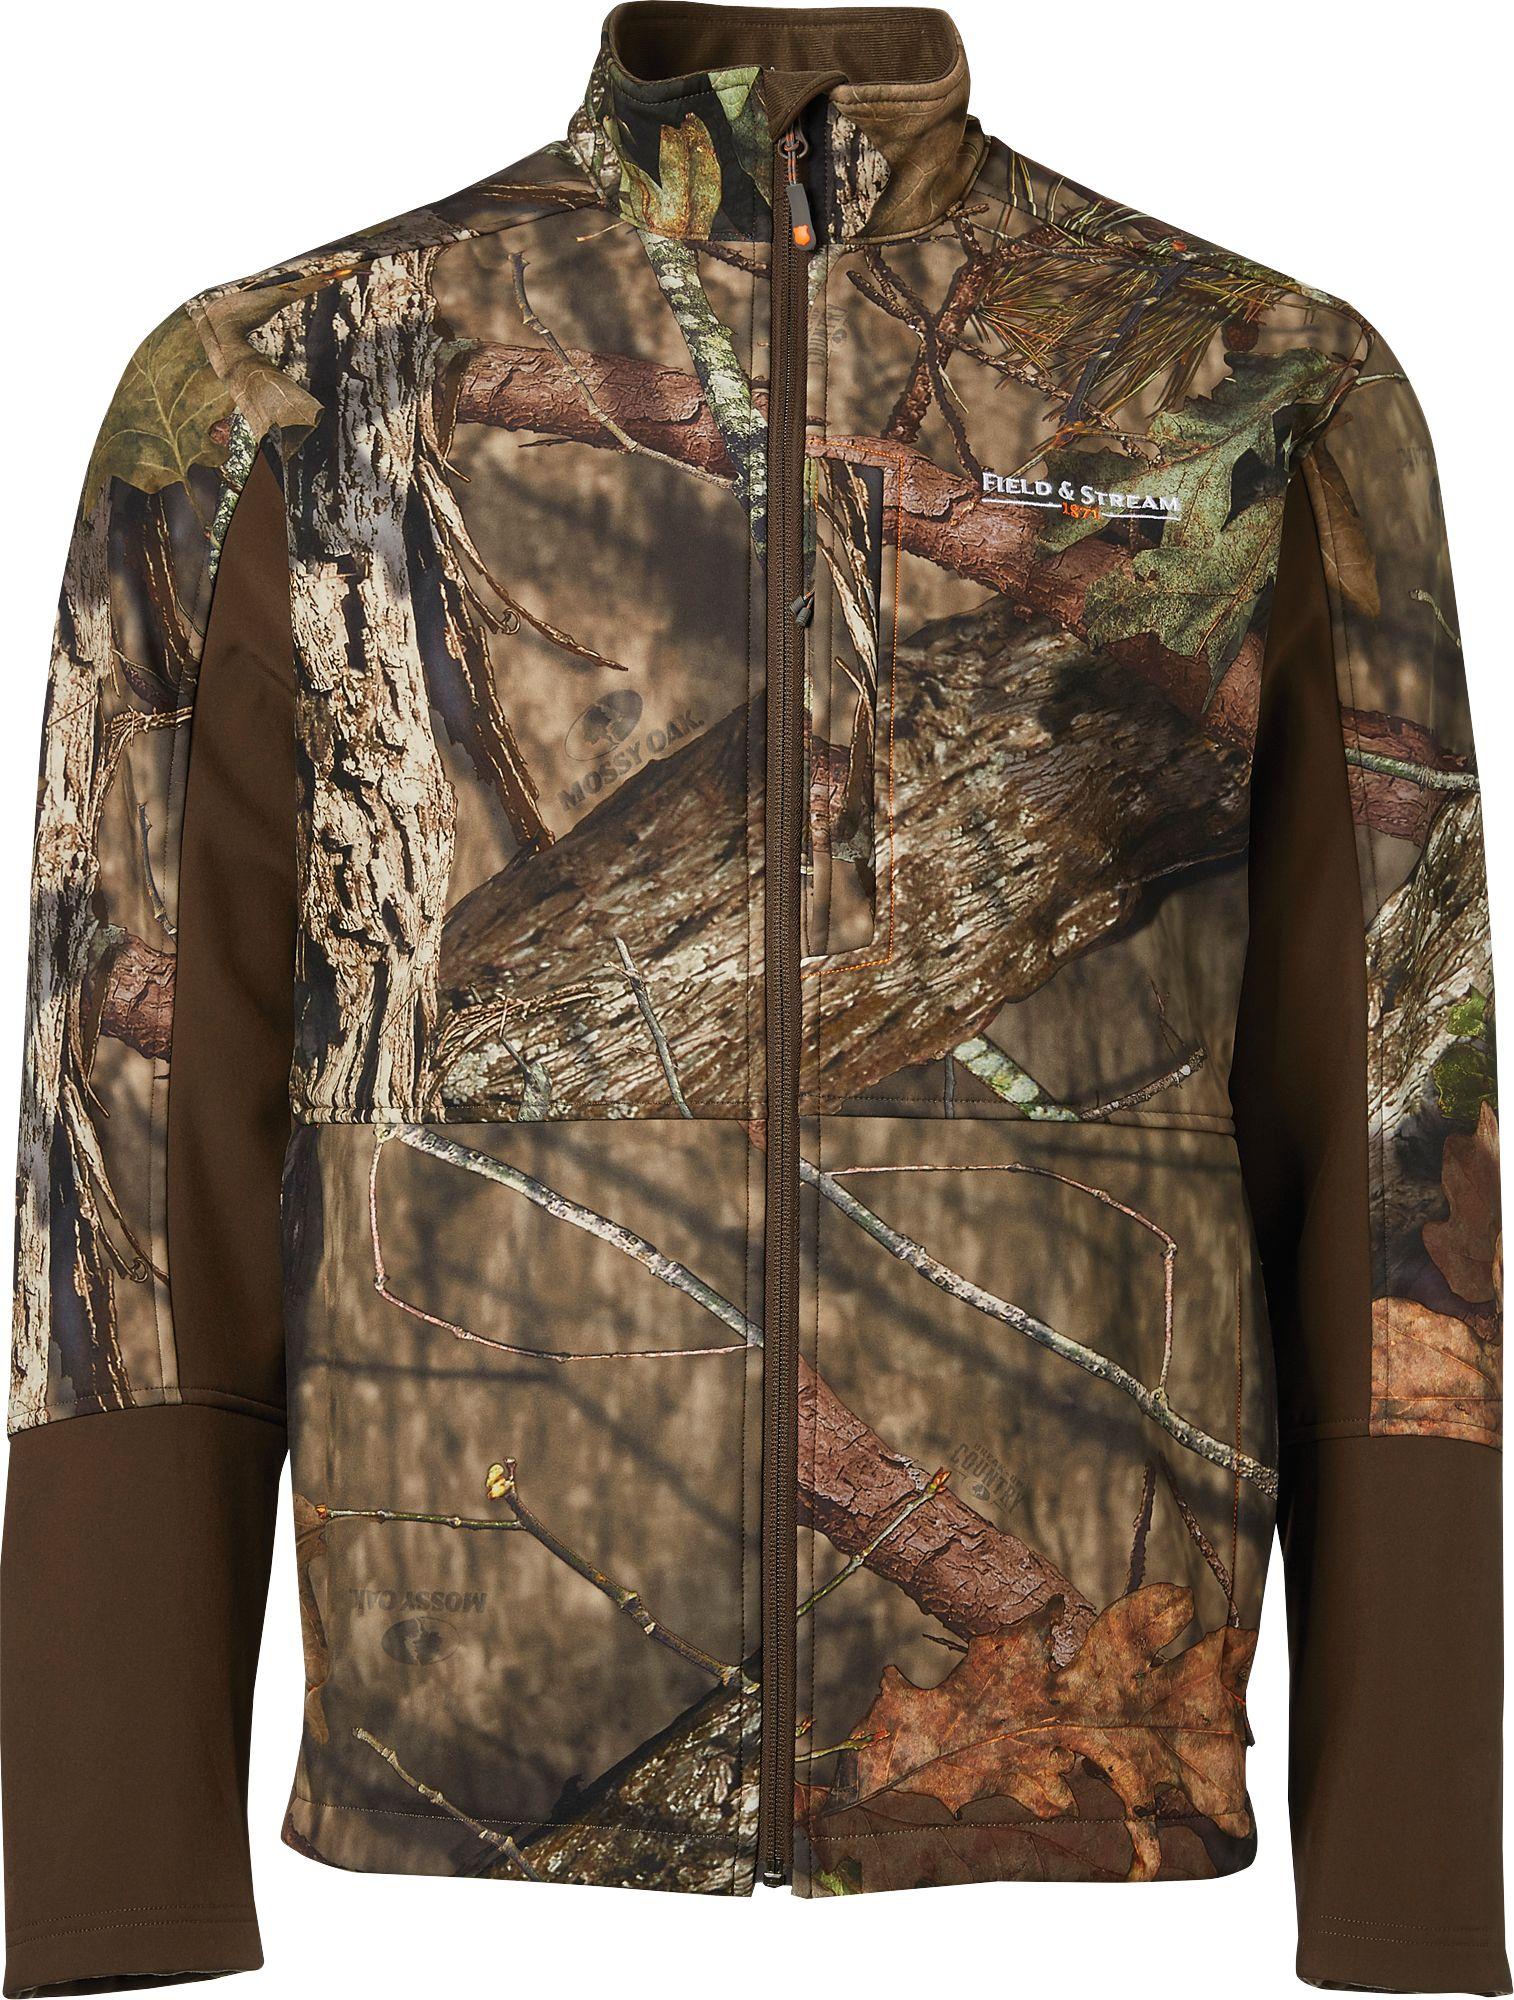 Field & Stream Men's Softshell Hunting Jacket, Size: Medium, Mossy Oak Brk Up Country thumbnail